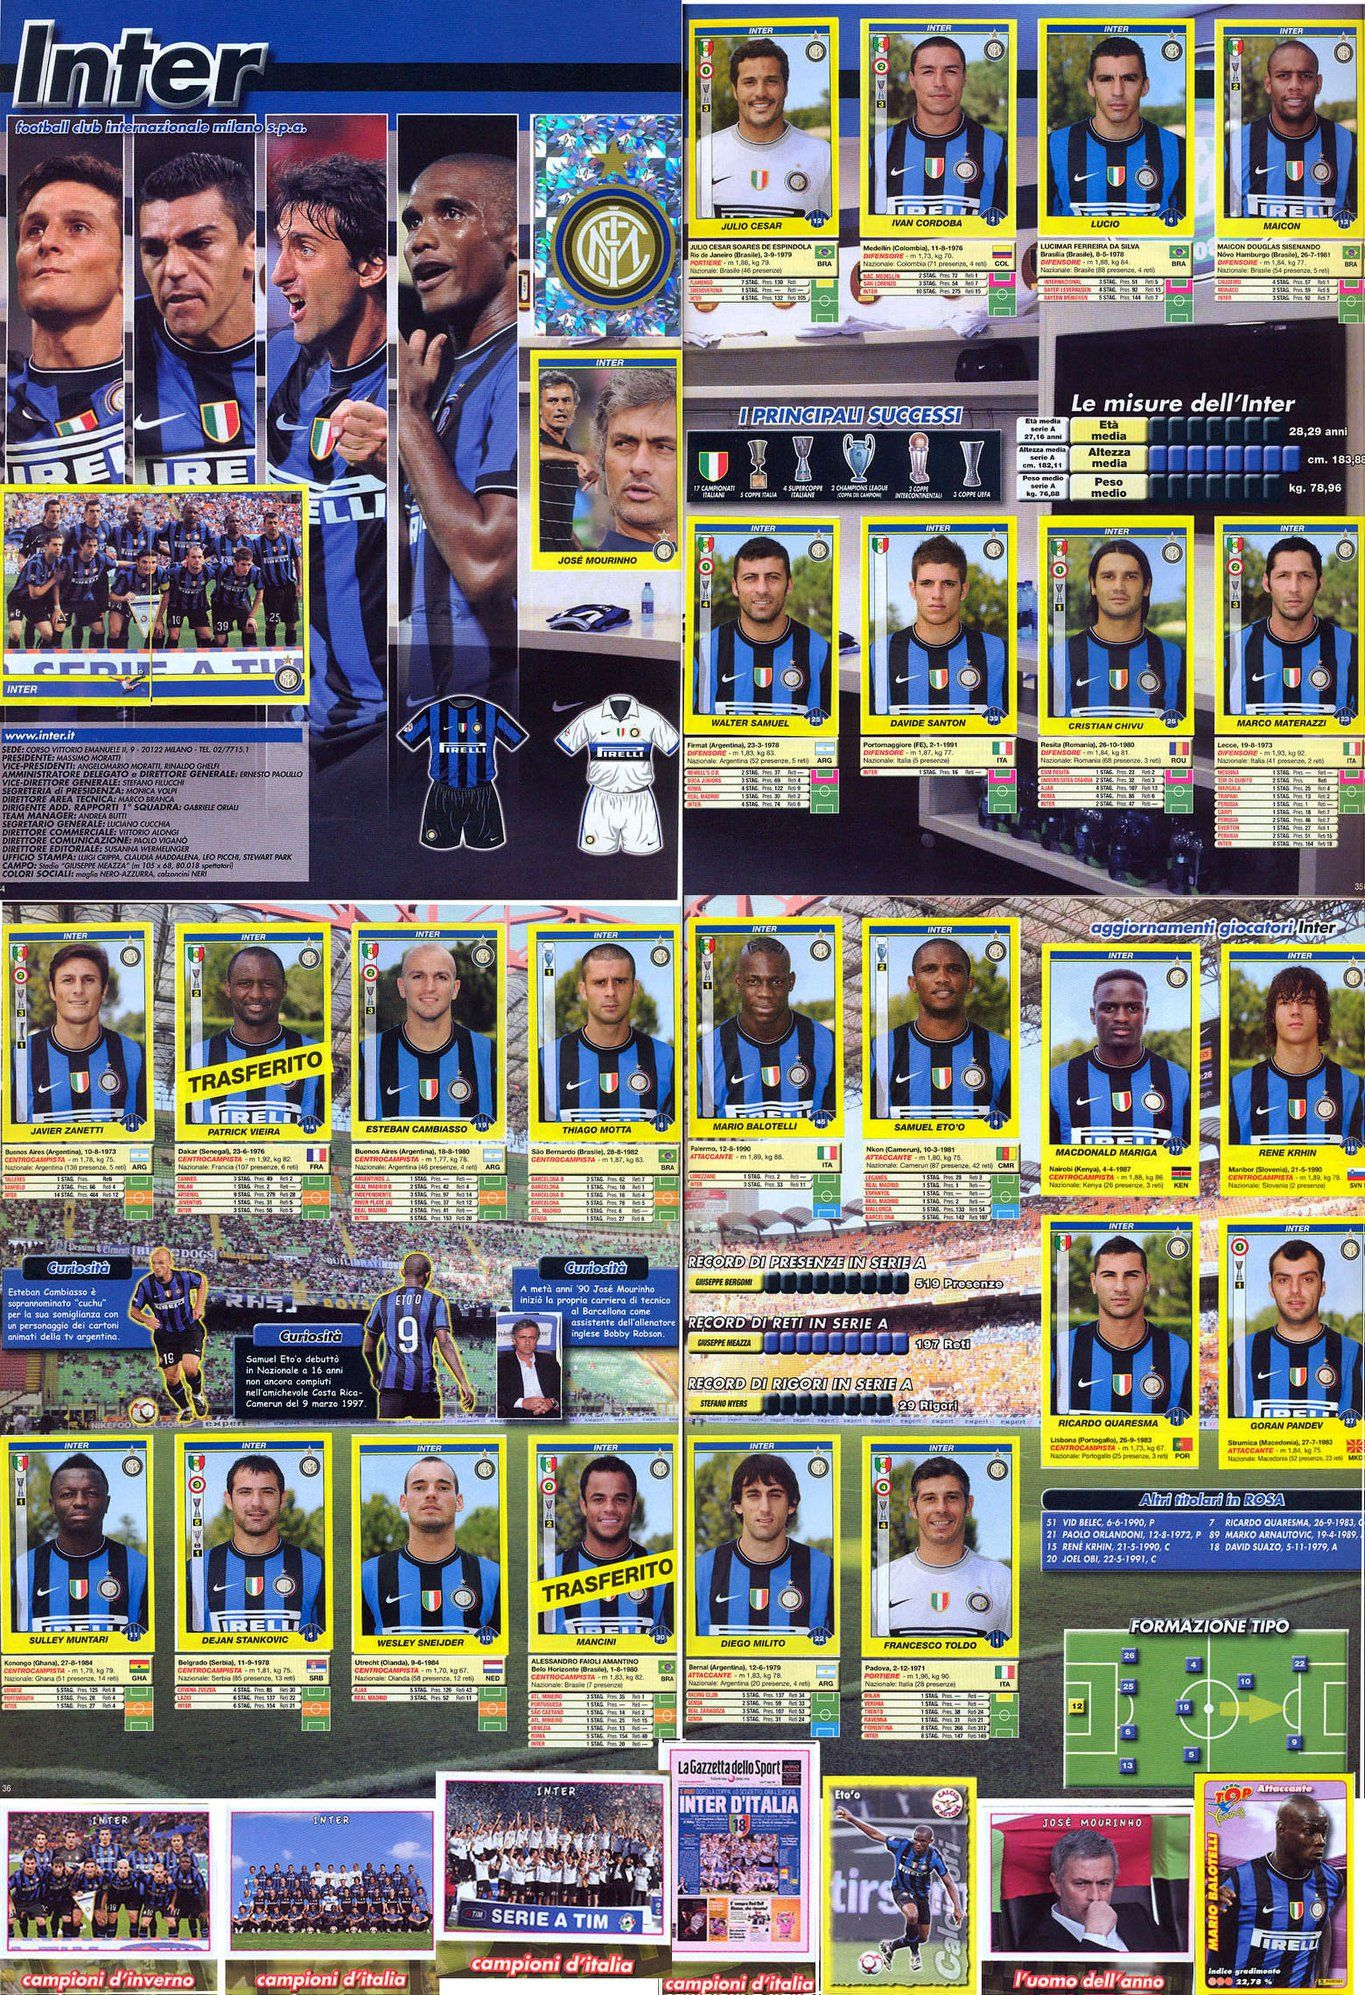 INTER Campione d'Italia 200910 figurine calciatori